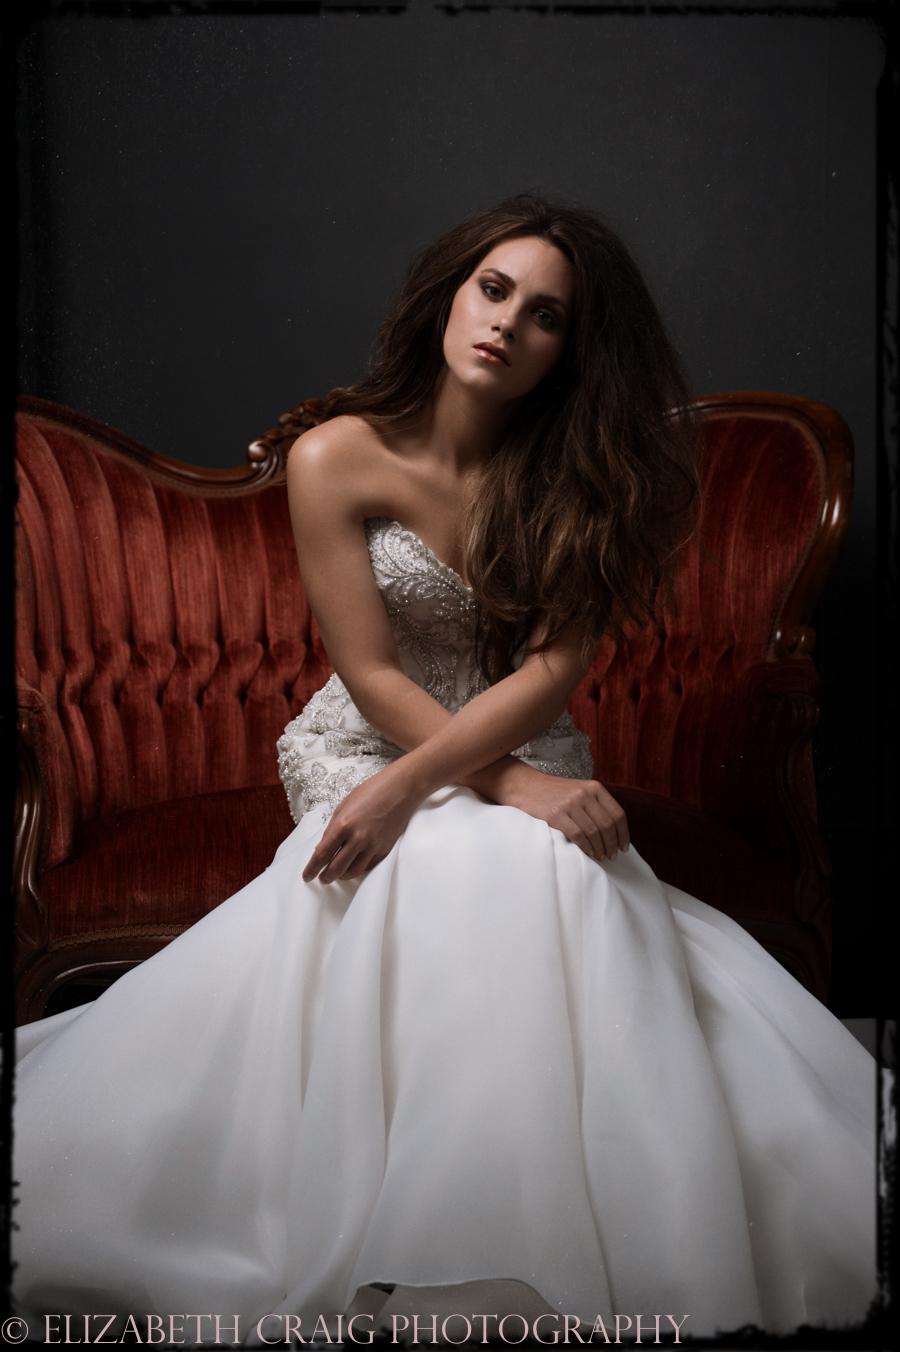 pittsburgh-boudoir-photographer-pittsburgh-wedding-photographer-elizabeth-craig-photography-004